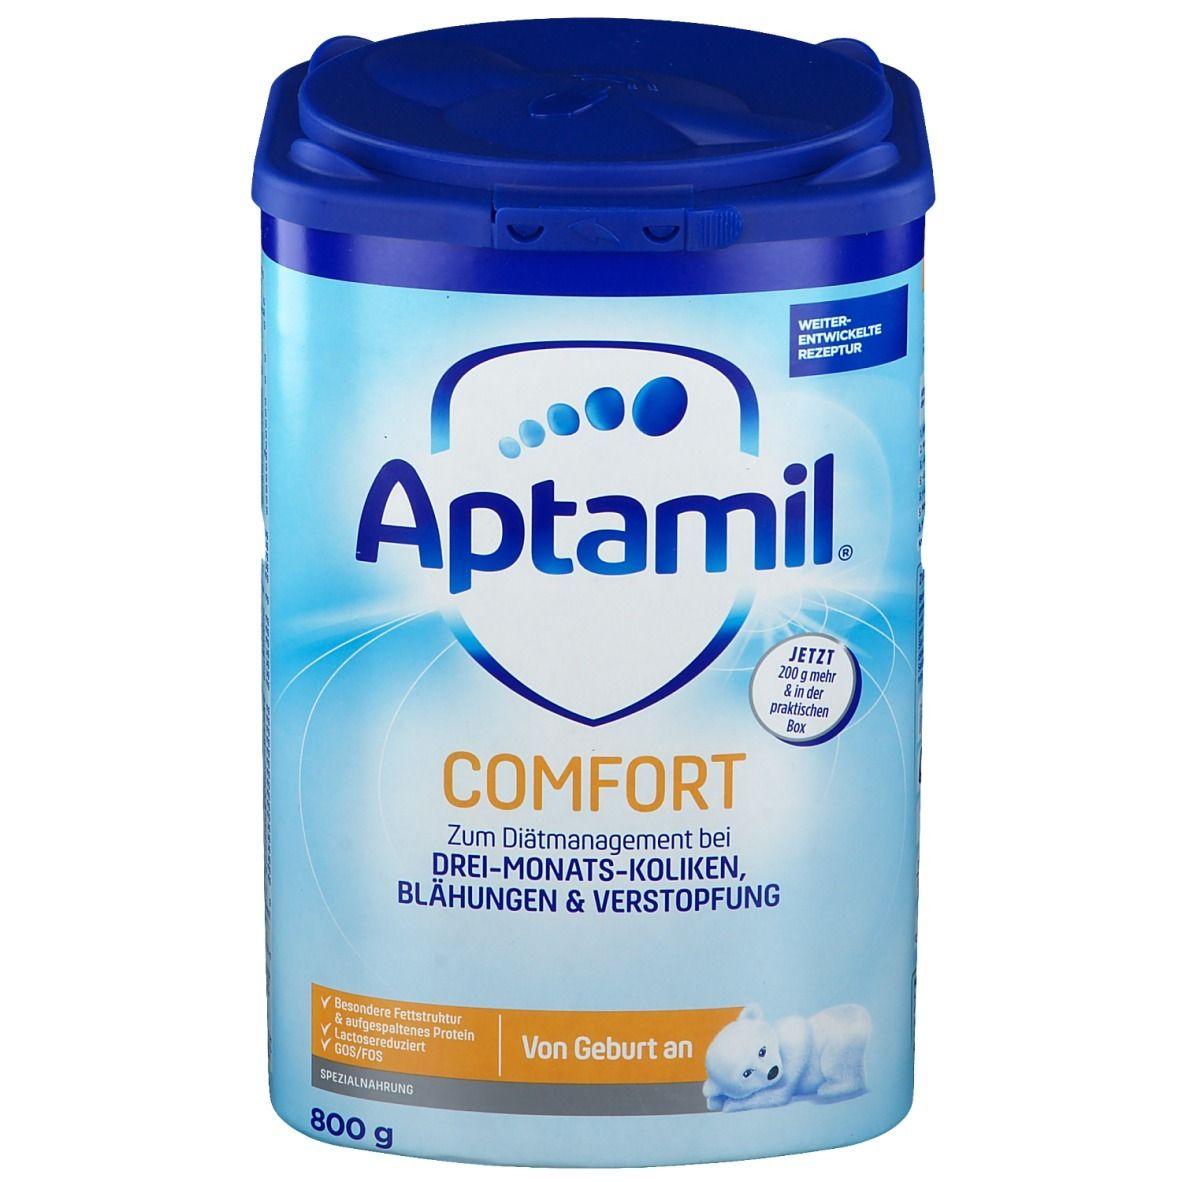 Original Aptamil 1, 2 and 3 Baby Formula German made